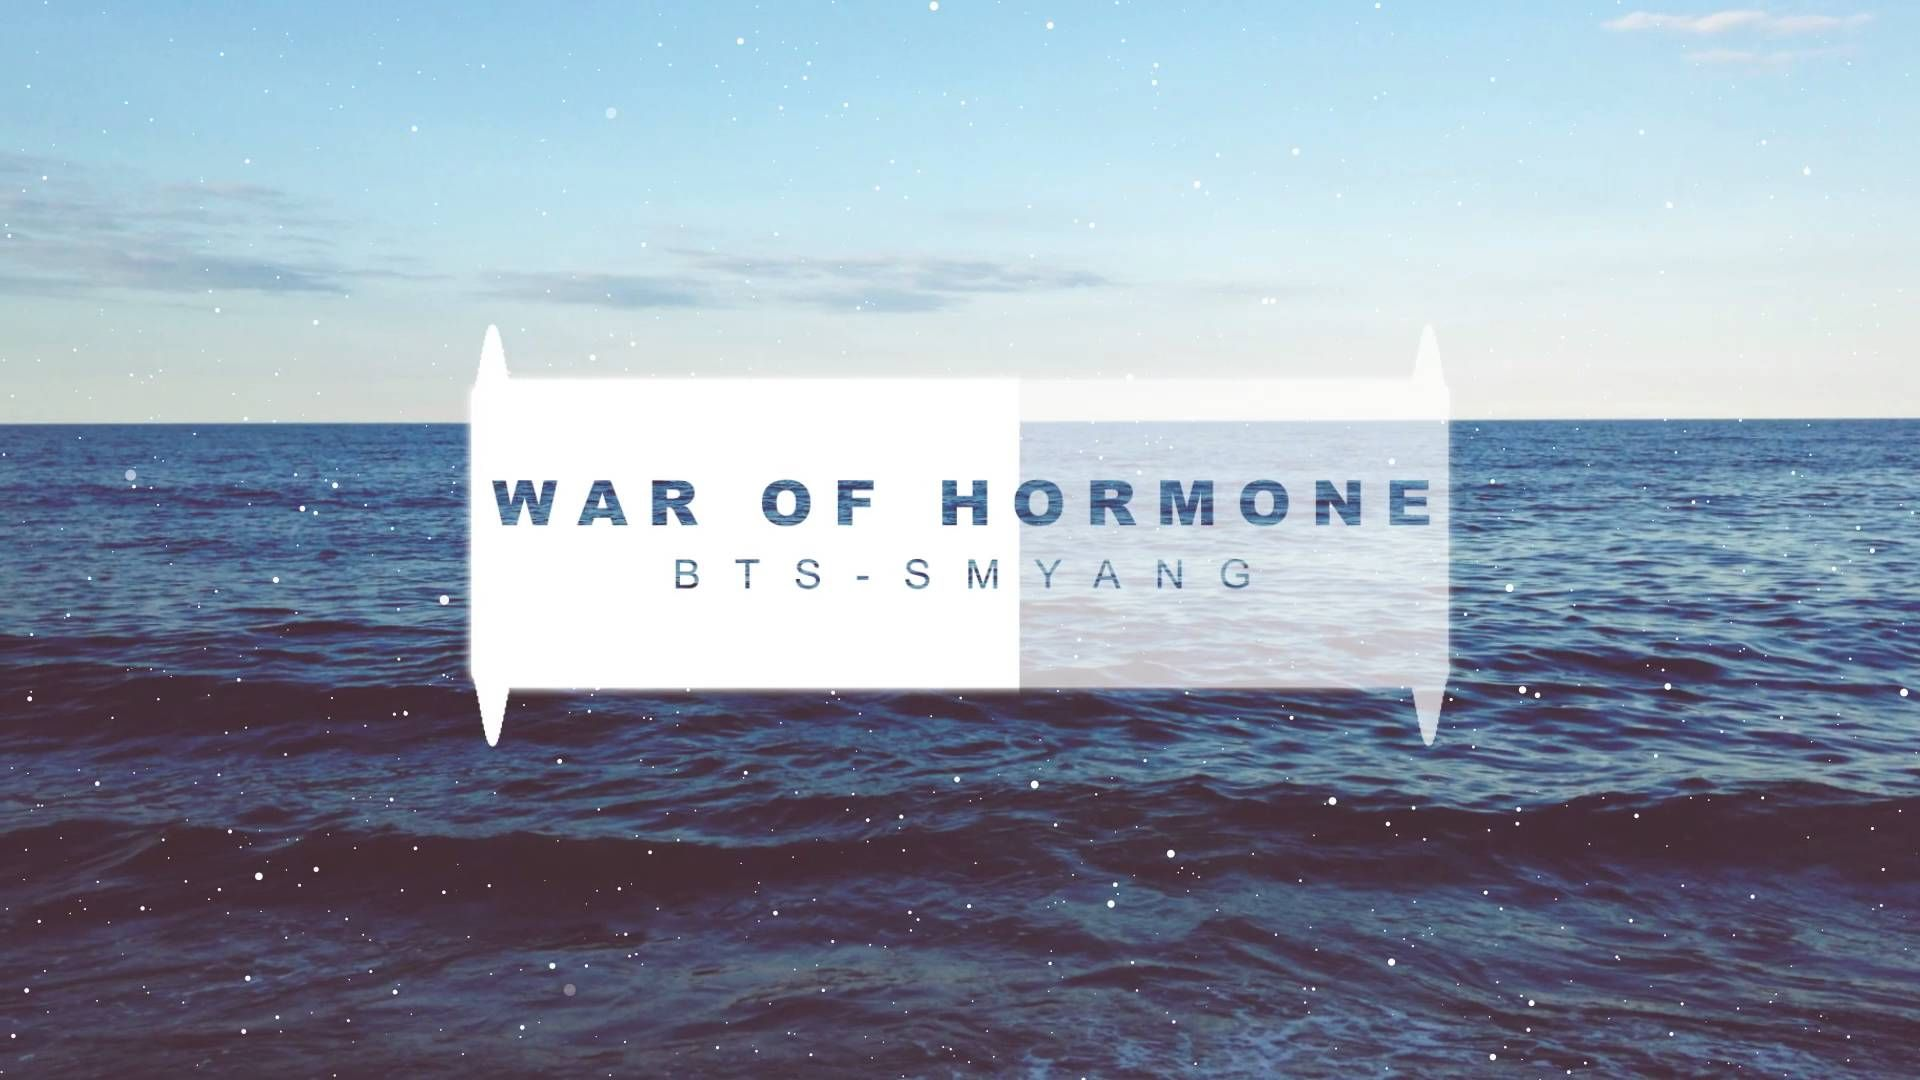 BTS (방탄소년단) - War of Hormone (호르몬 전쟁) - Piano Cover